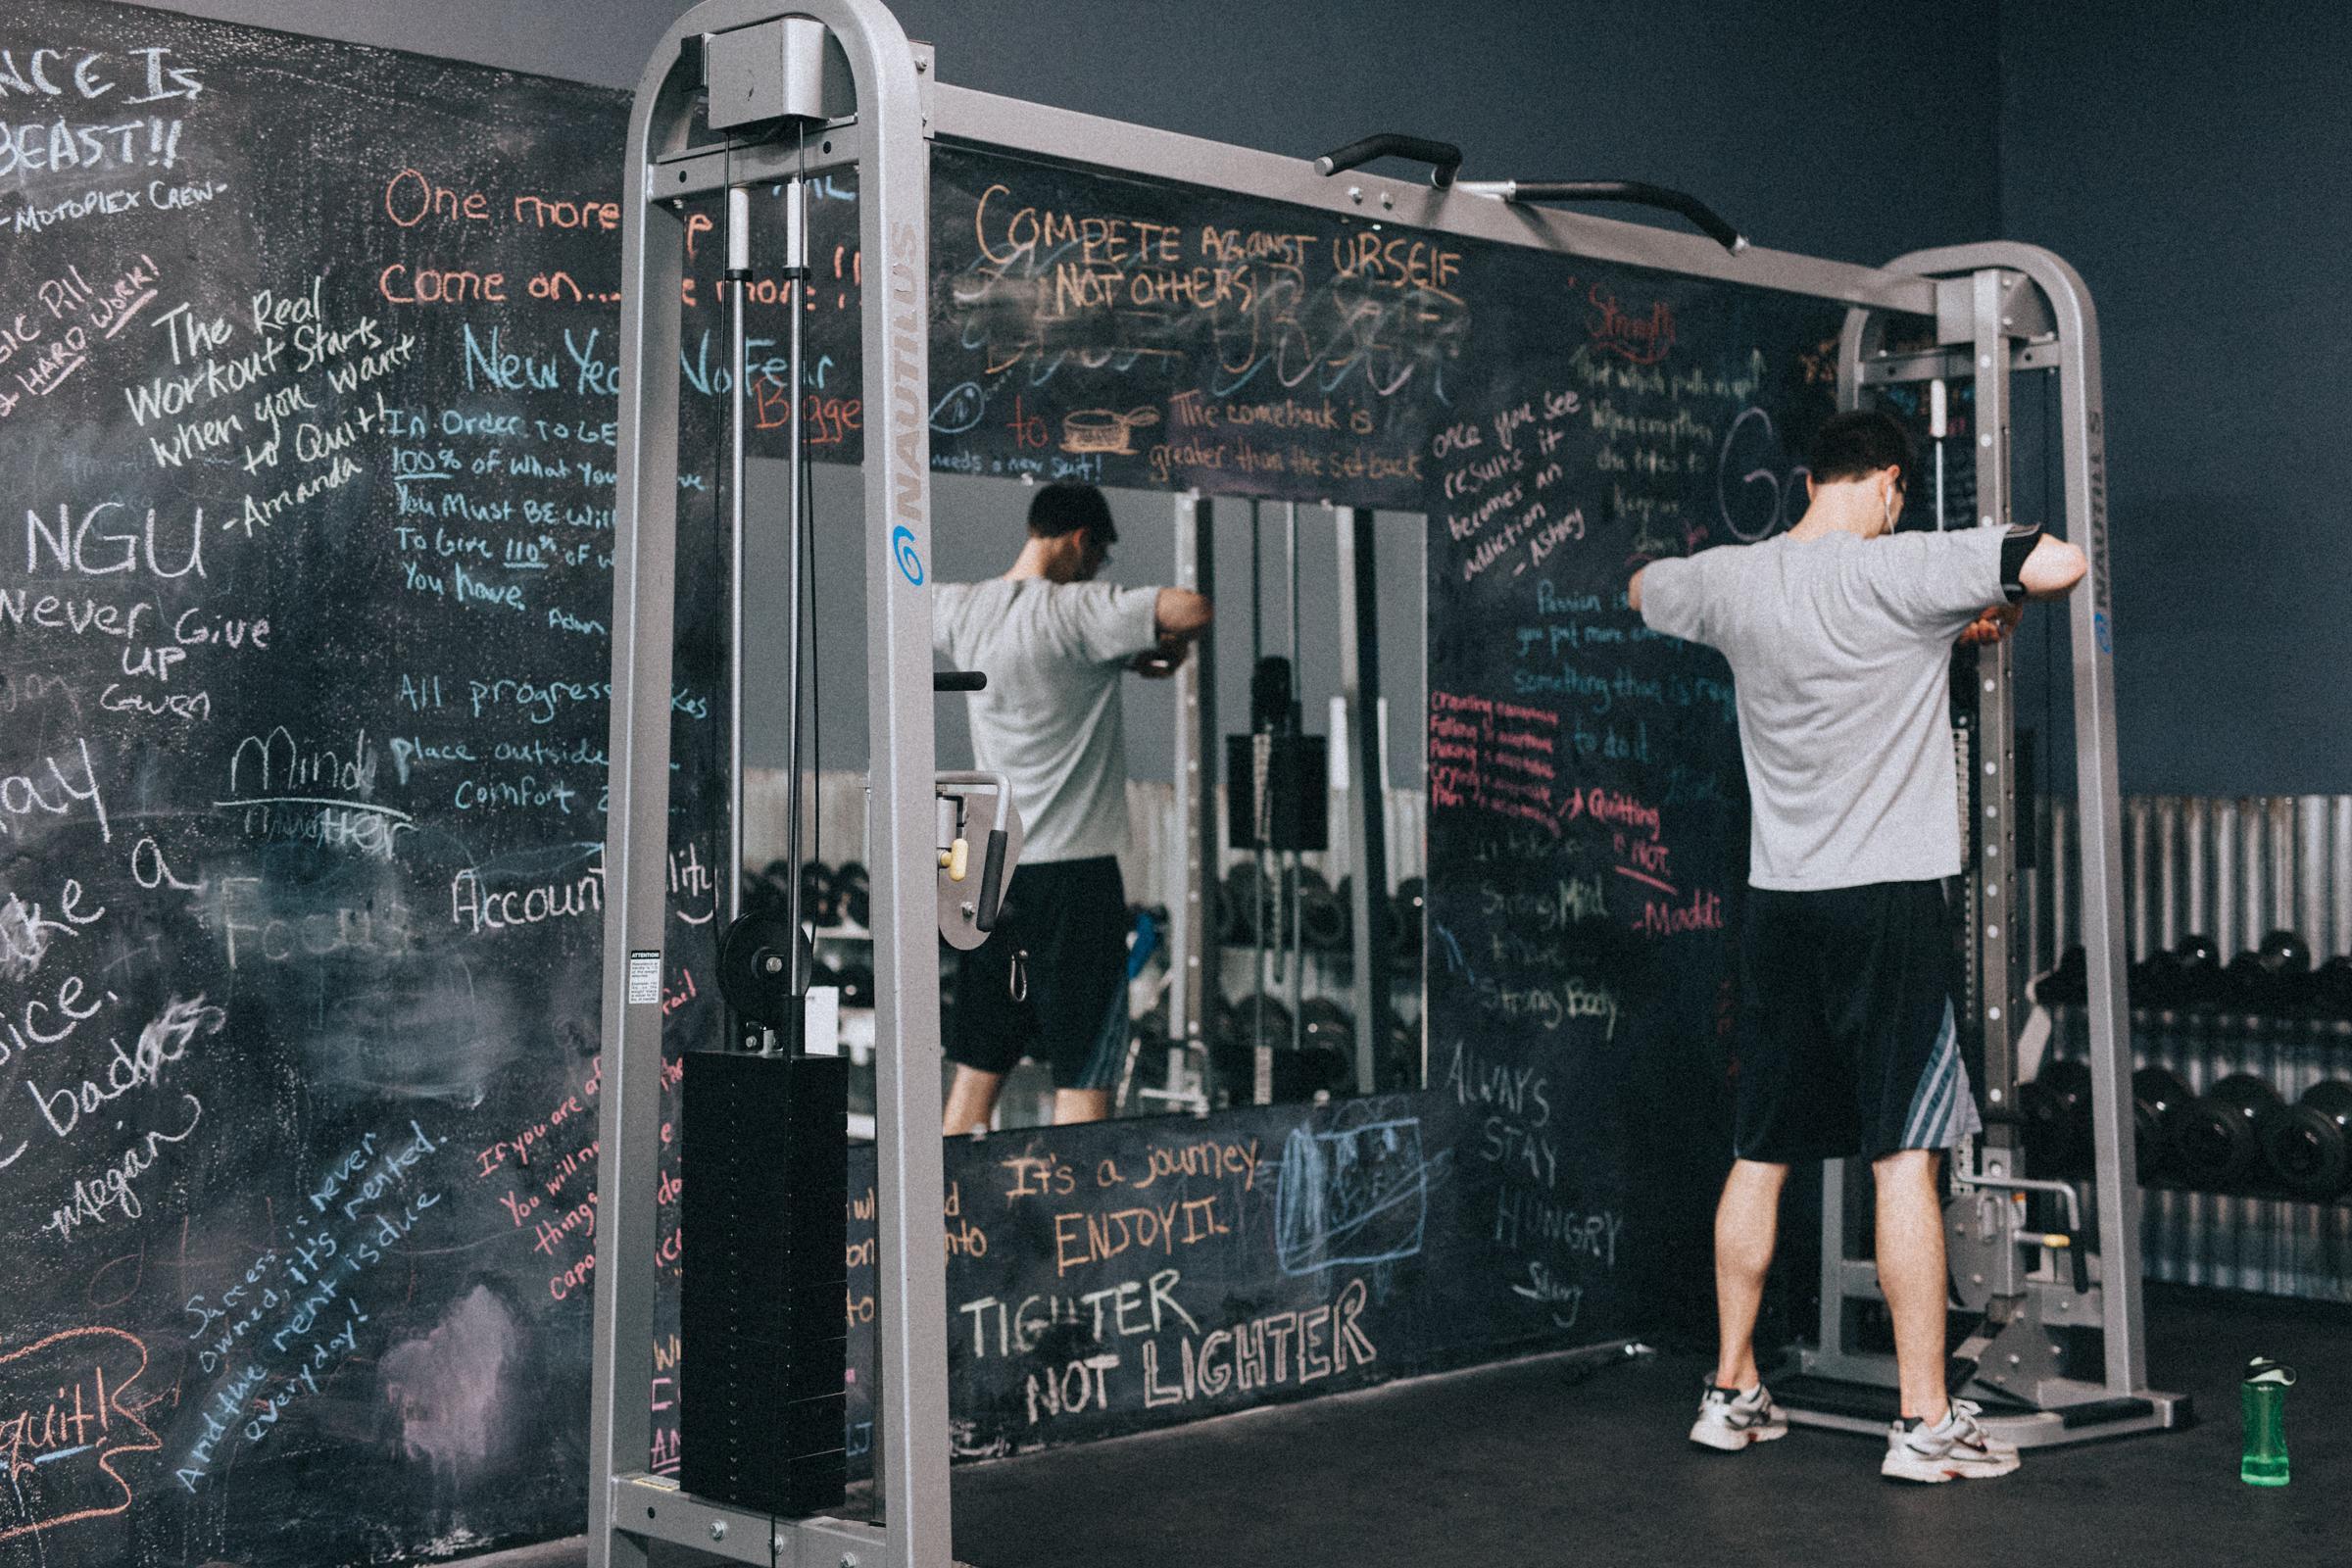 001-Stronger.Version.Fitness.Gym.Shots.18-63.jpg